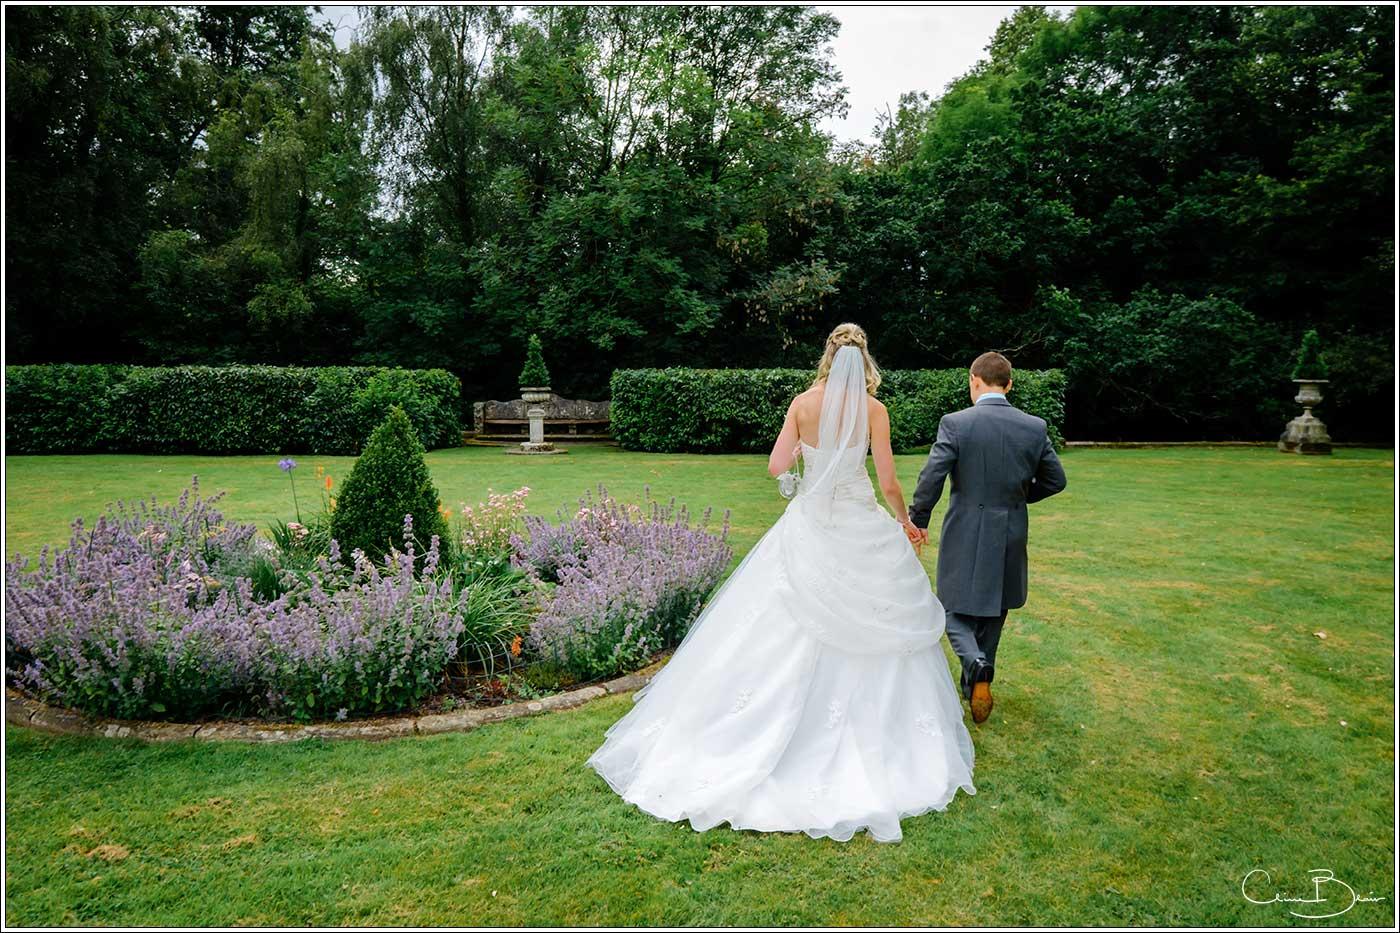 Bride and groom in Hampton Manor garden-by Hampton manor wedding photographer Clive Blair Photography